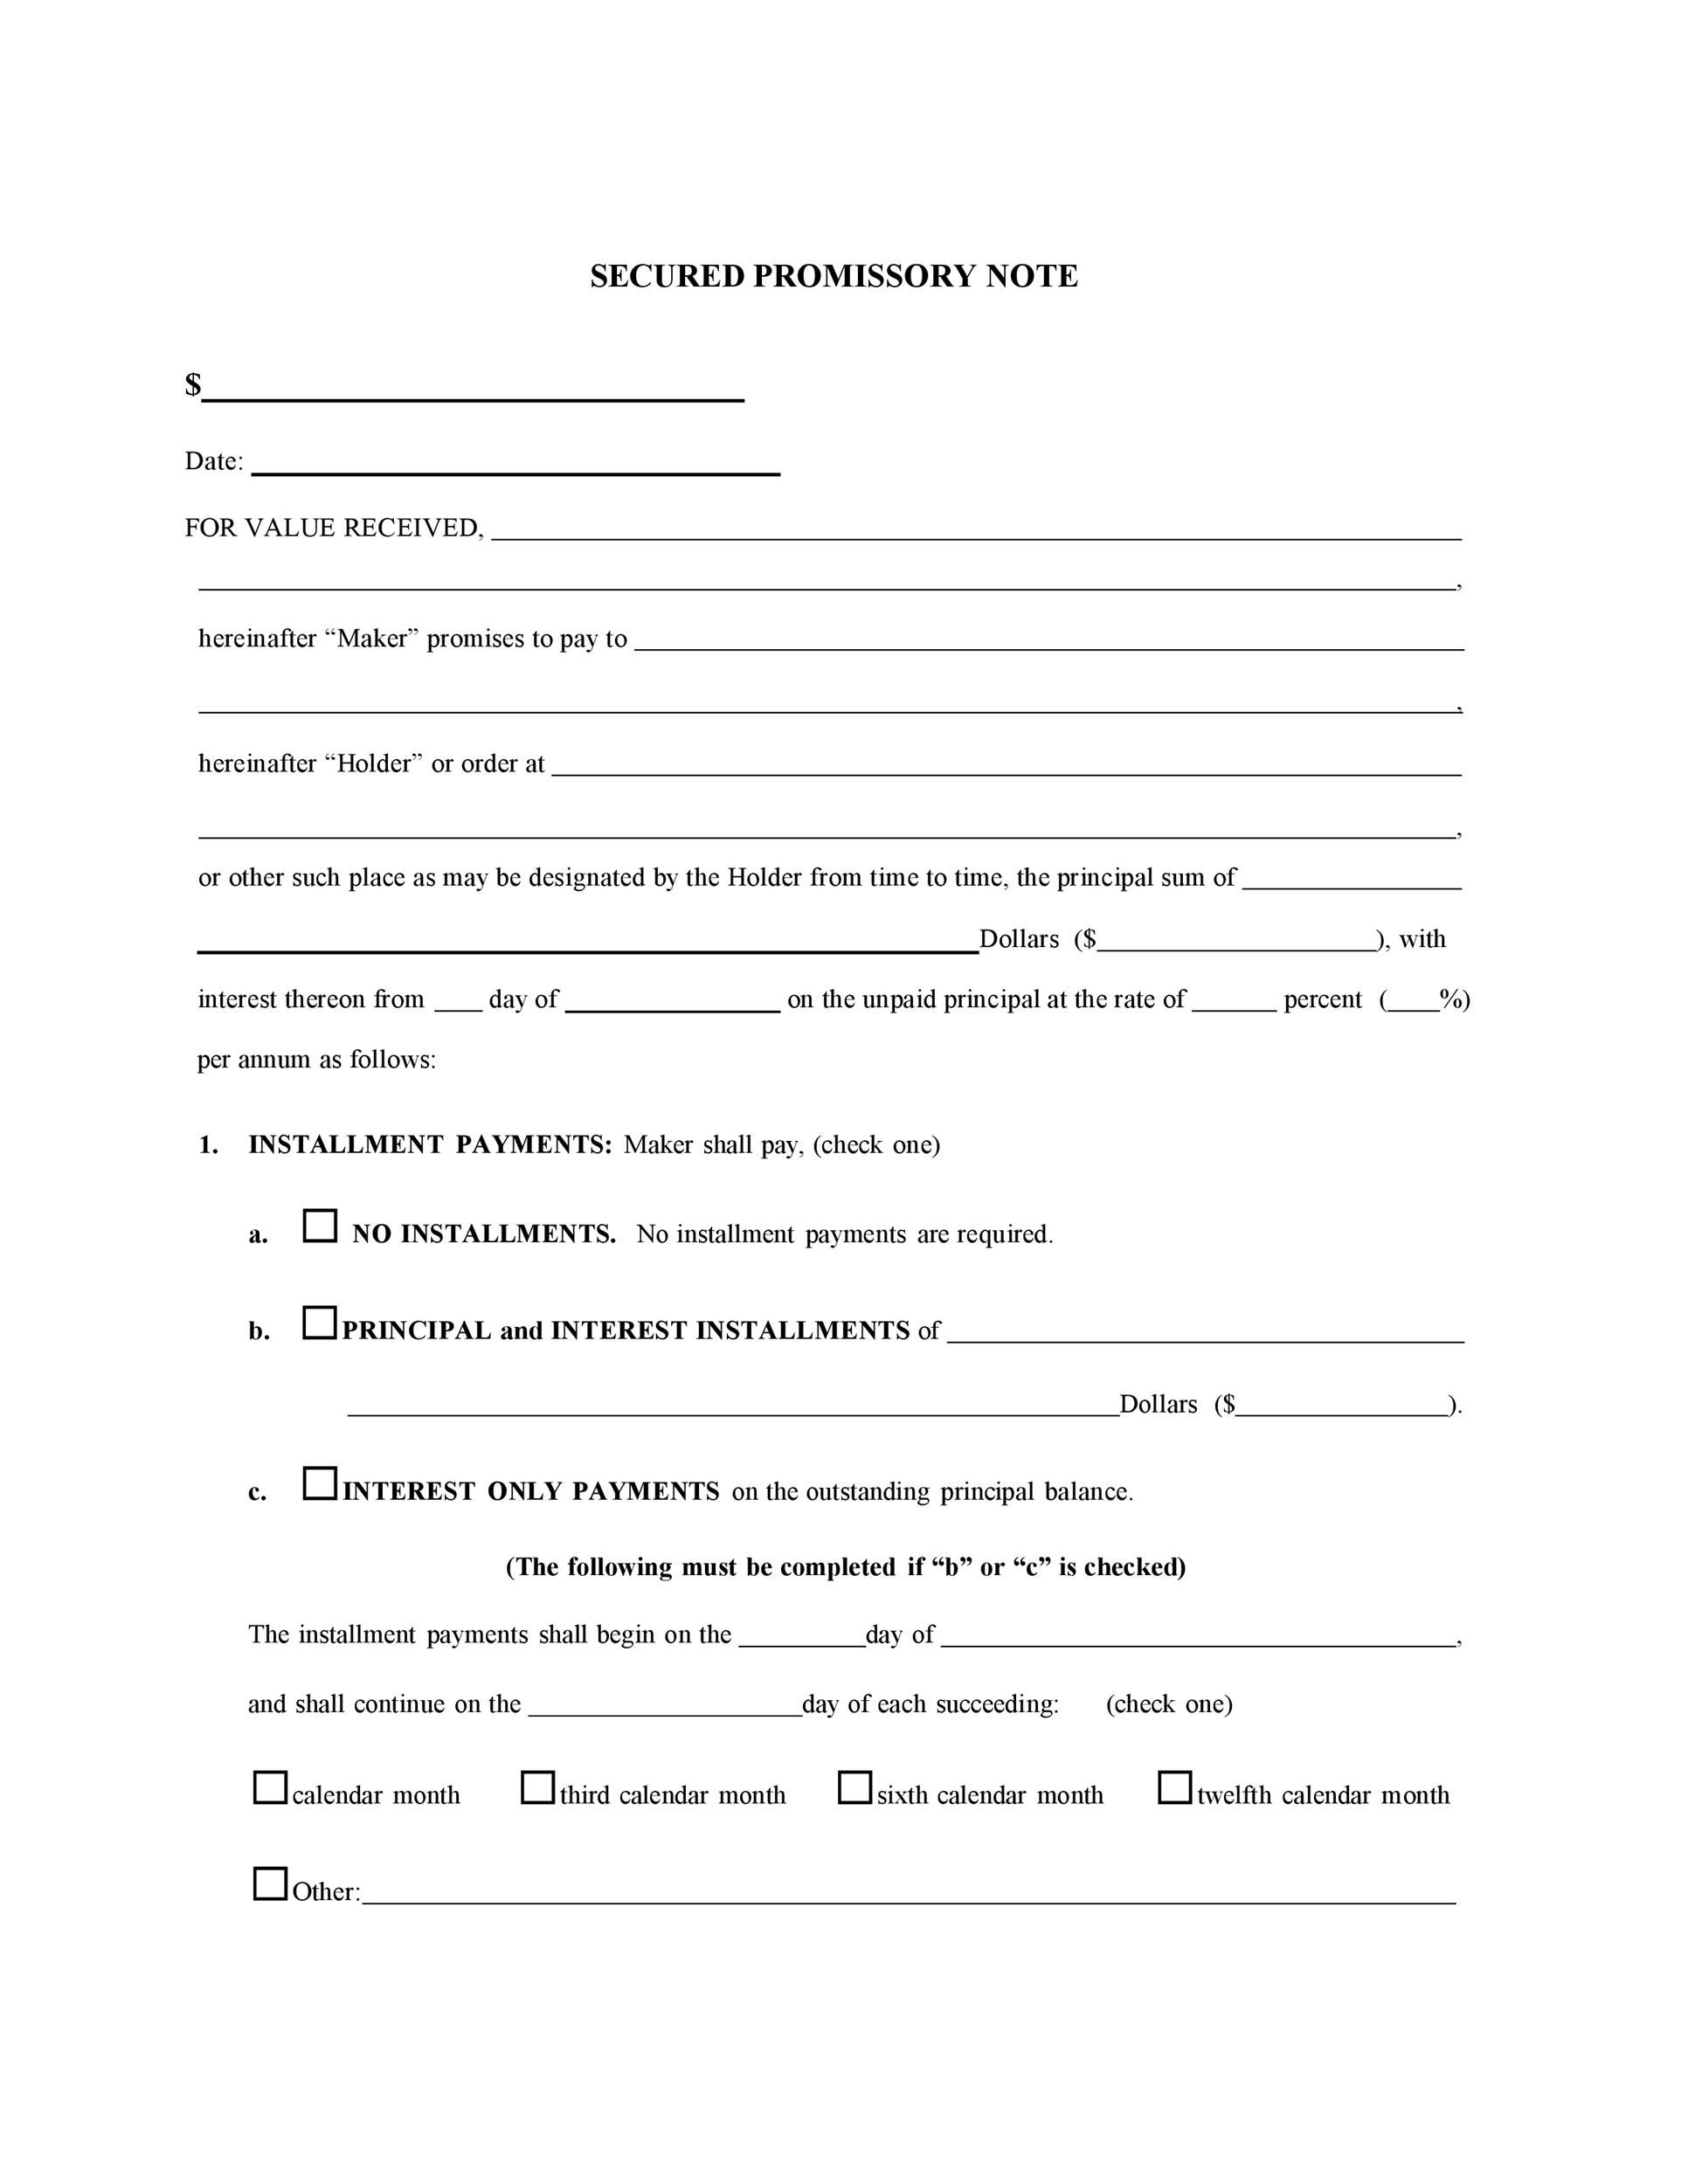 005 Sensational Promissory Note Template Word Image  Document Uk Sample In FormatFull